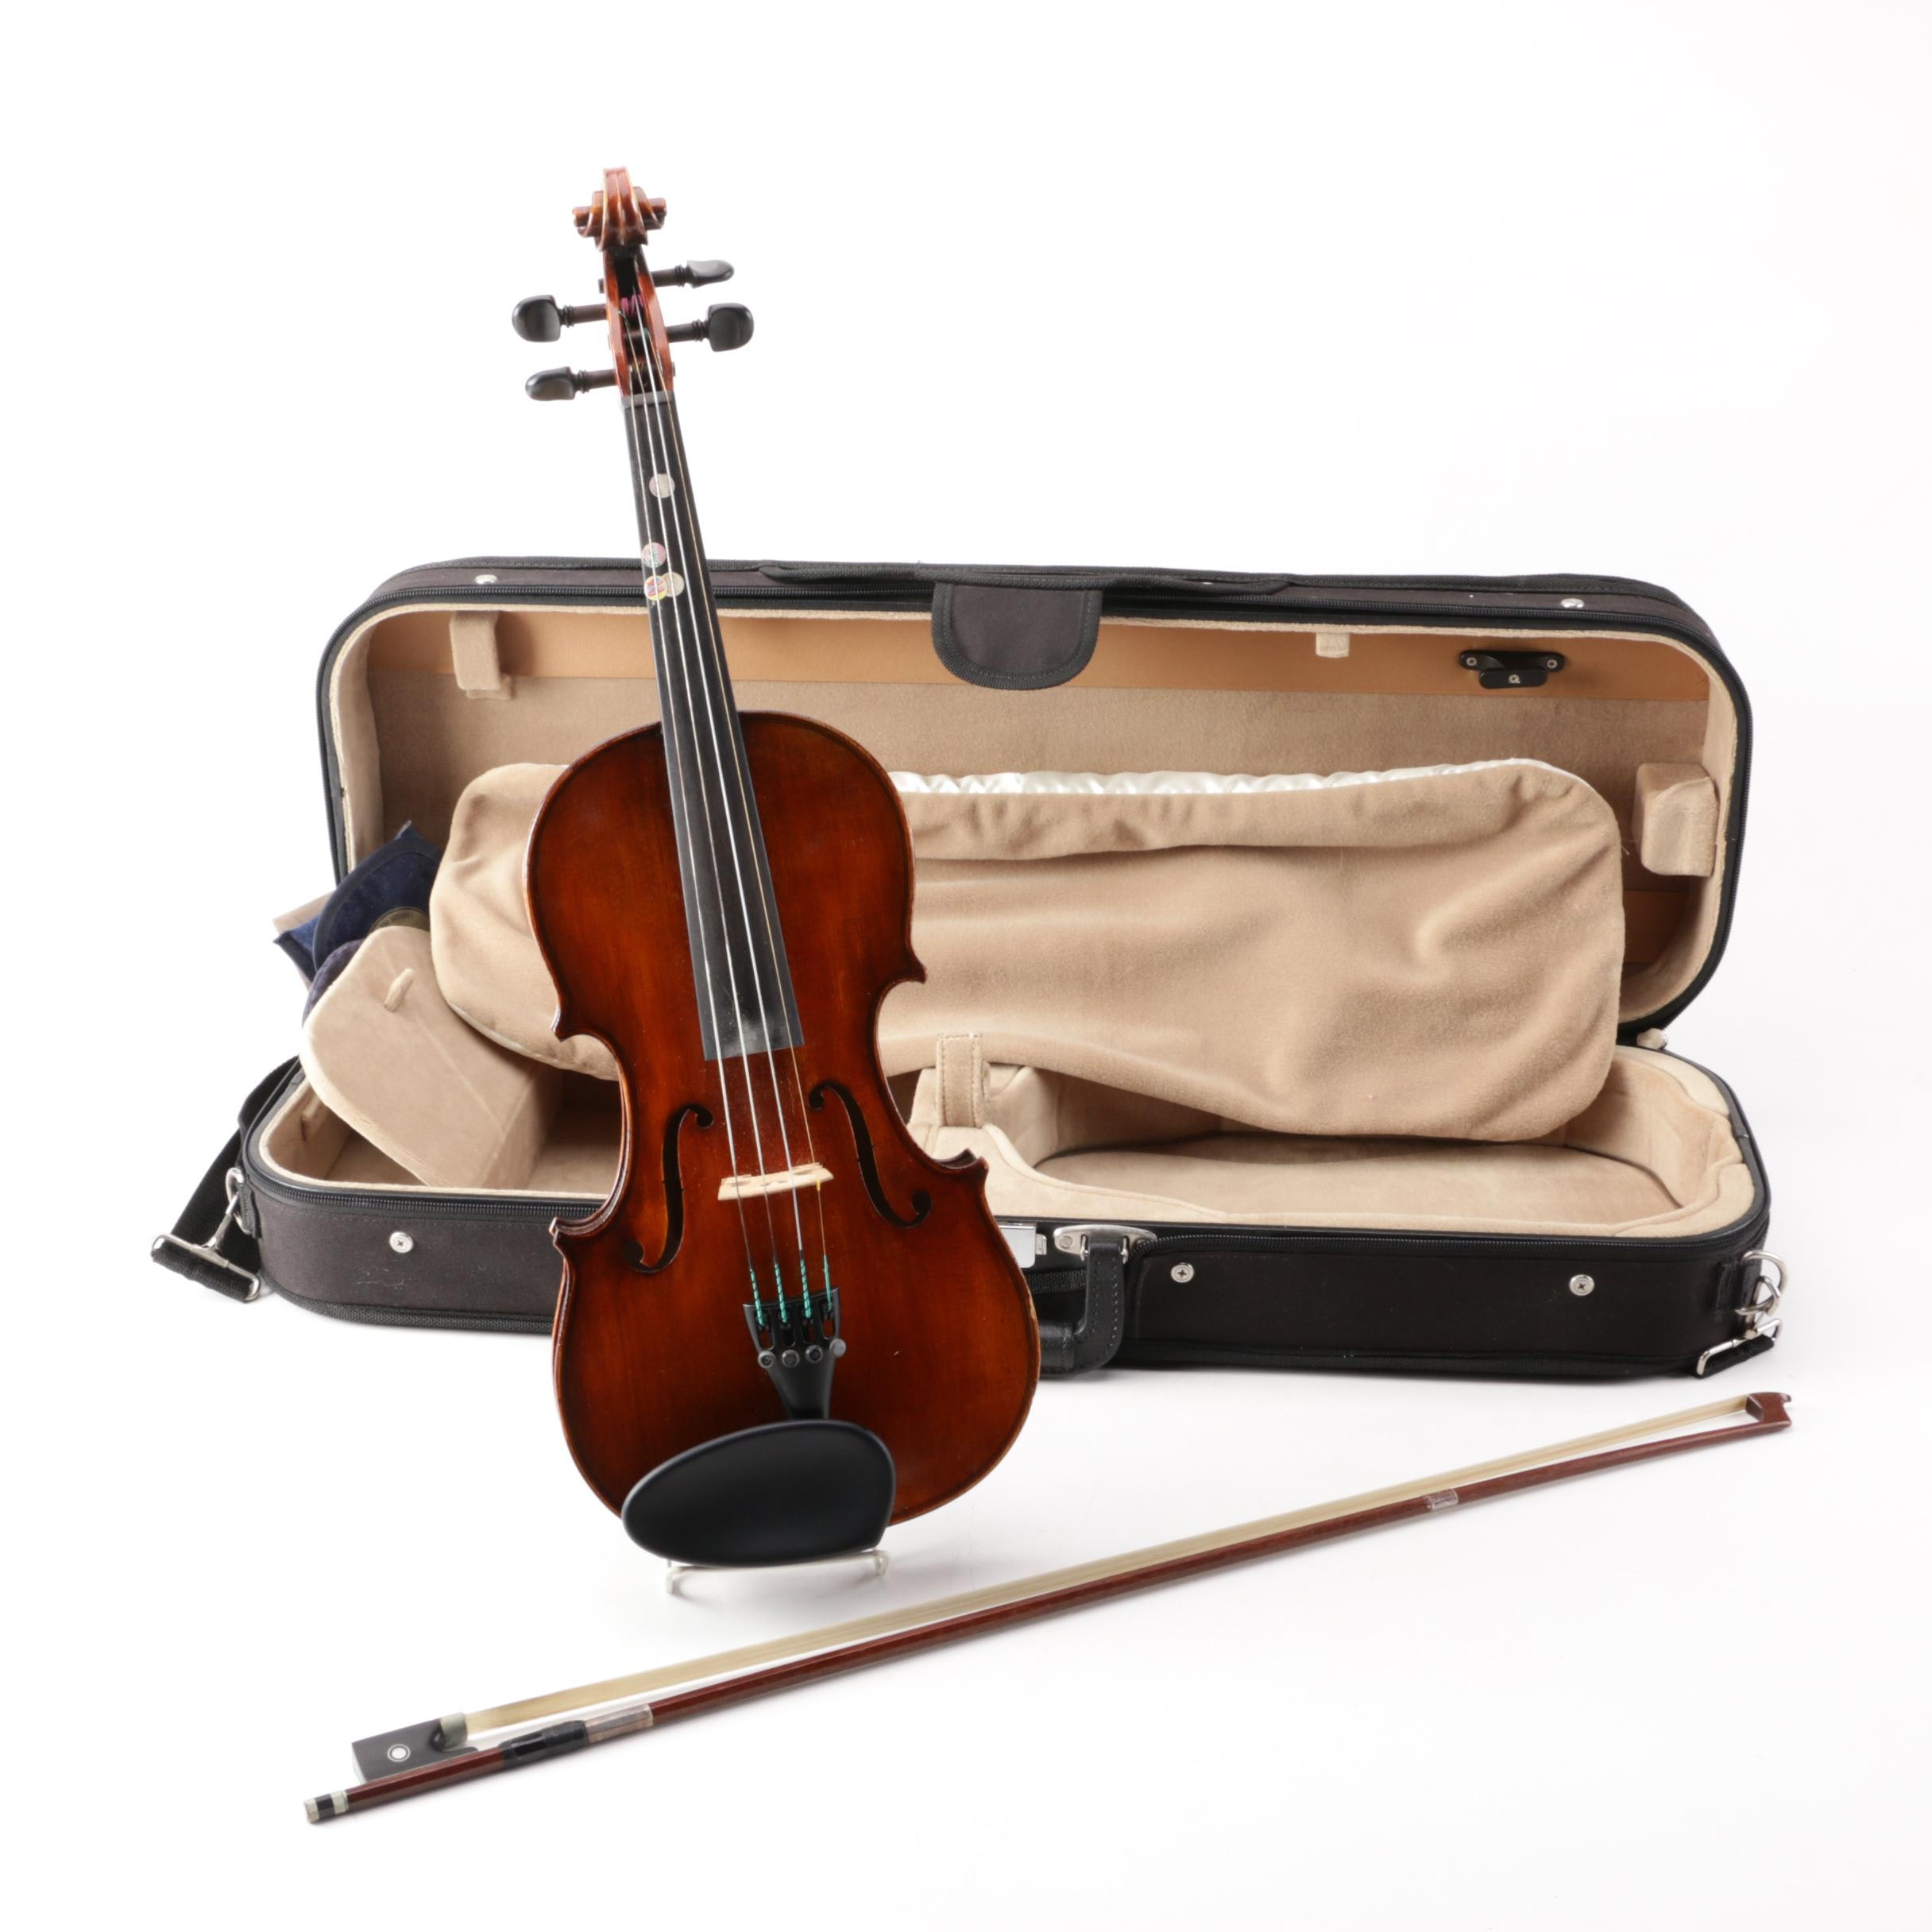 Rudoulf Doetsch 3/4 Stradivarius Copy Violin with Jean-Joseph Martin Bow